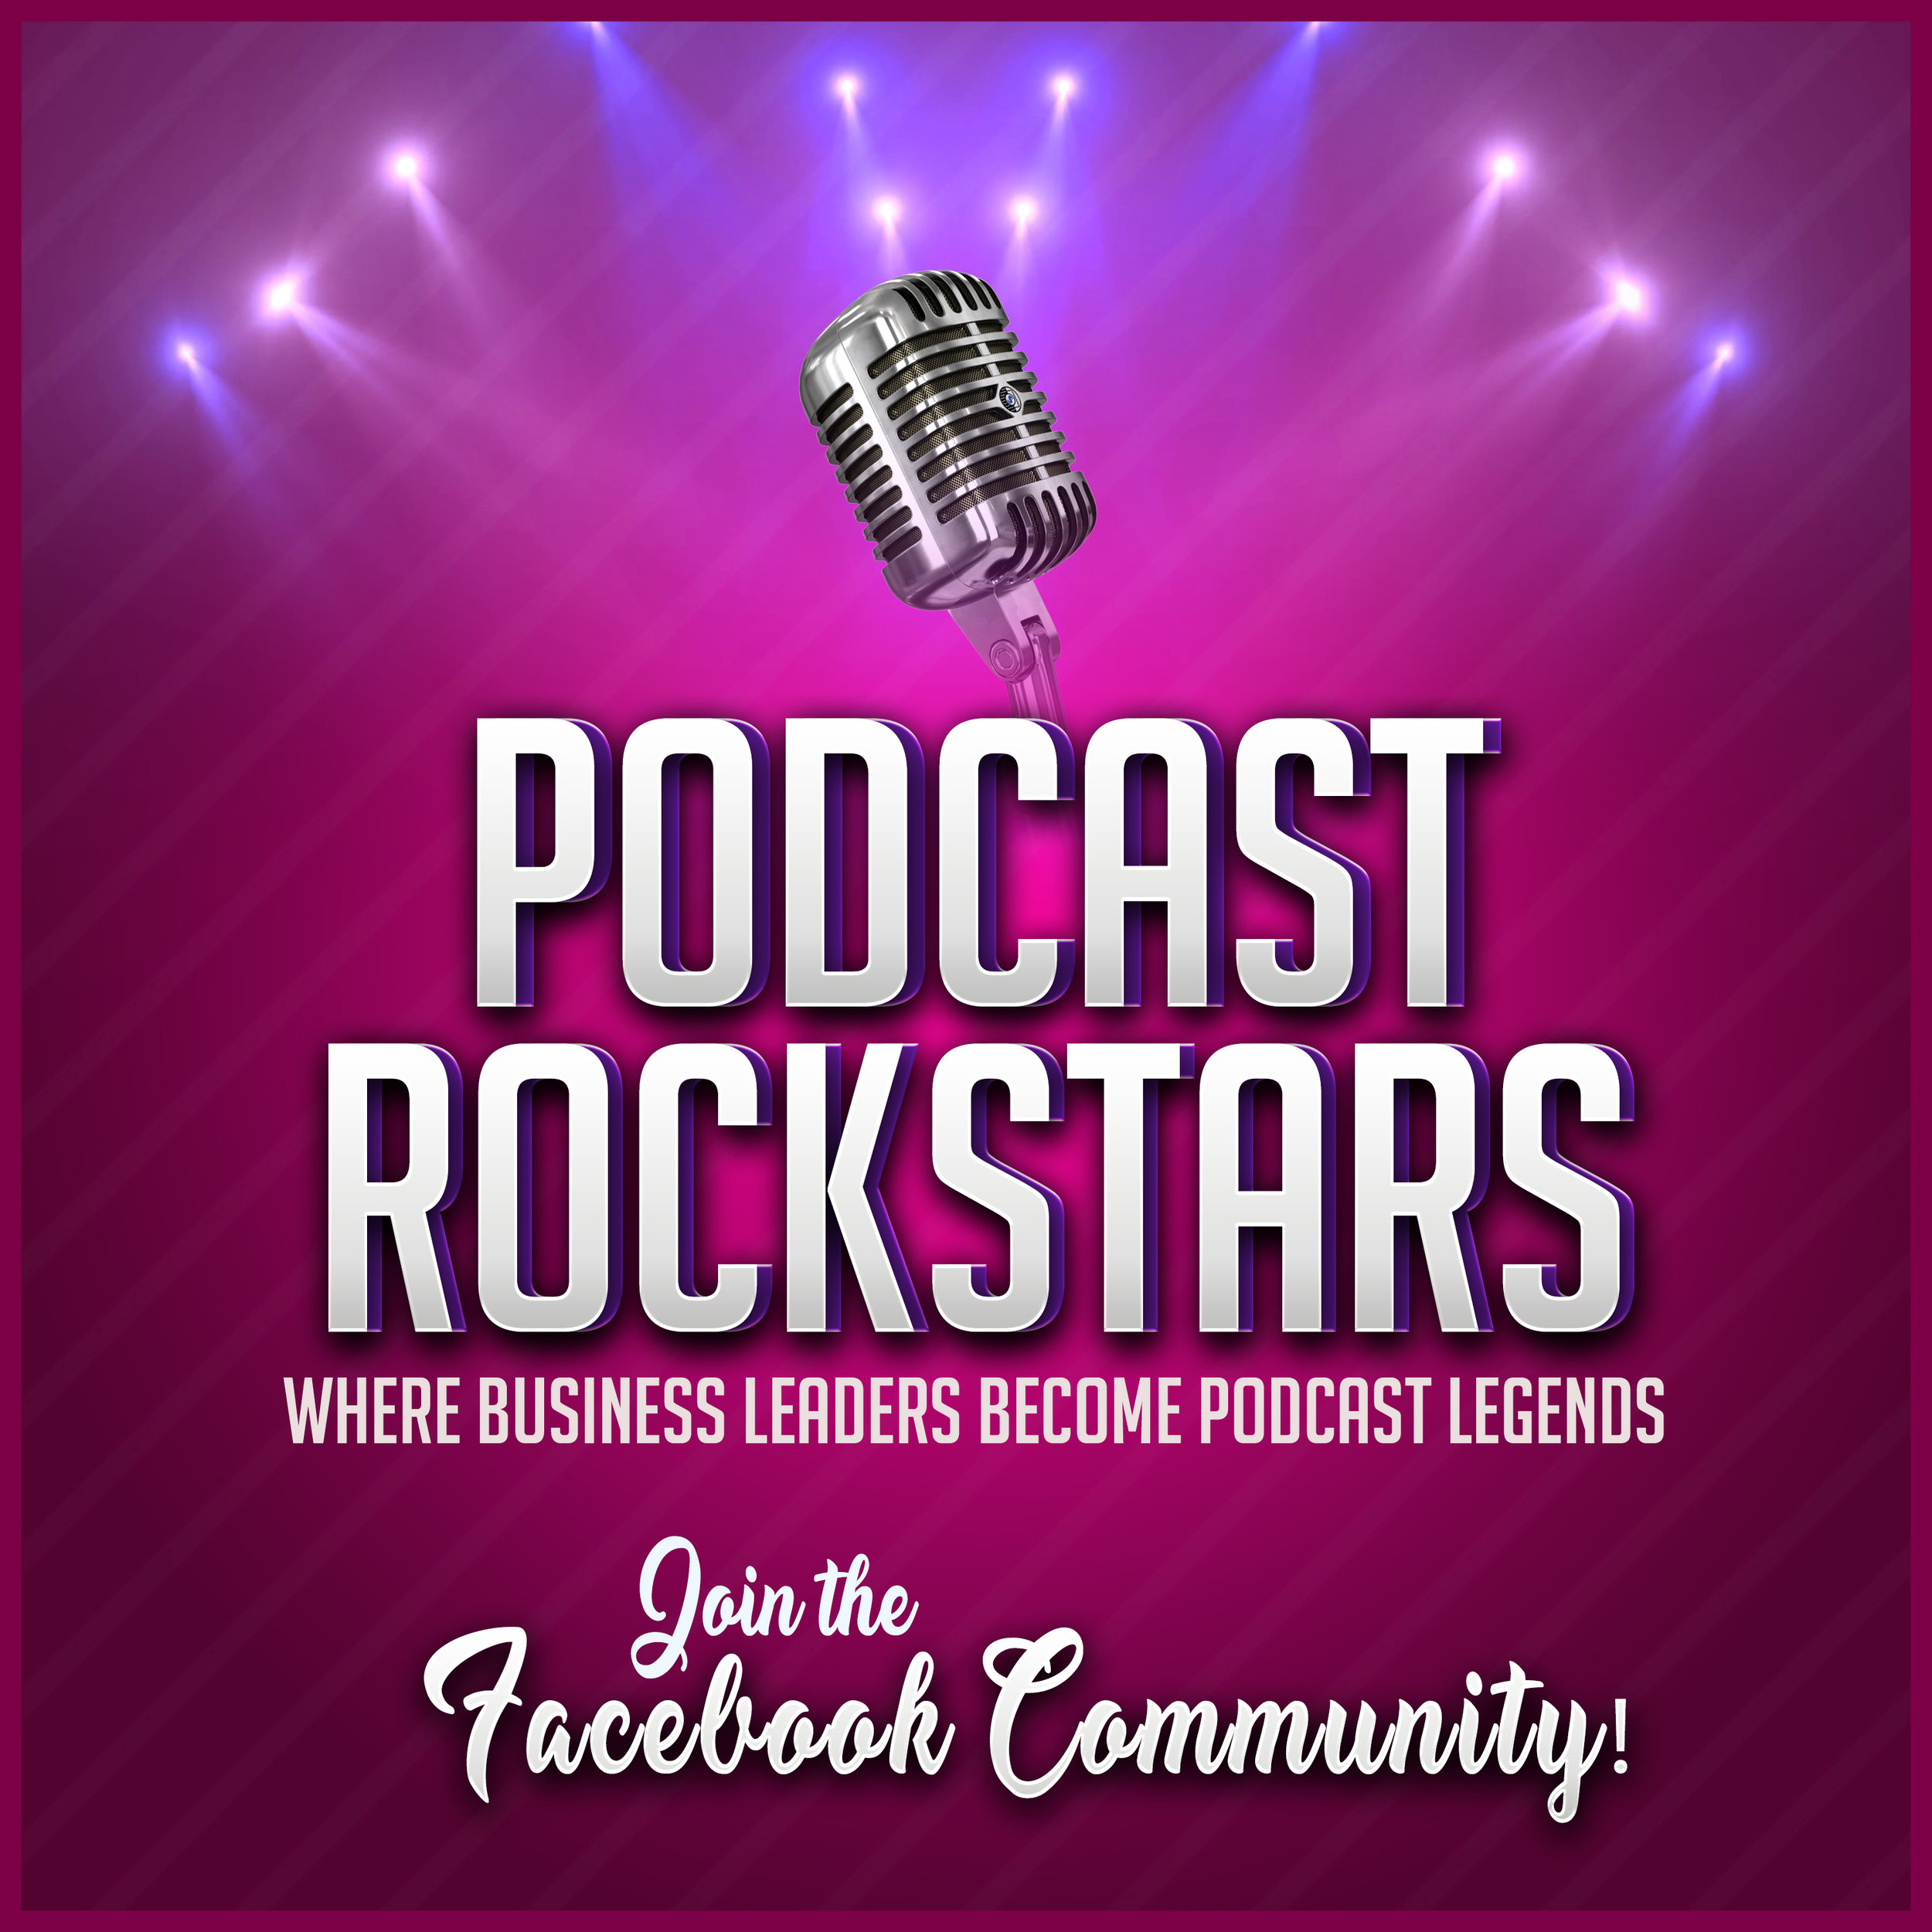 Podcast Rockstar-copy-2-Join_FB_Community.jpg